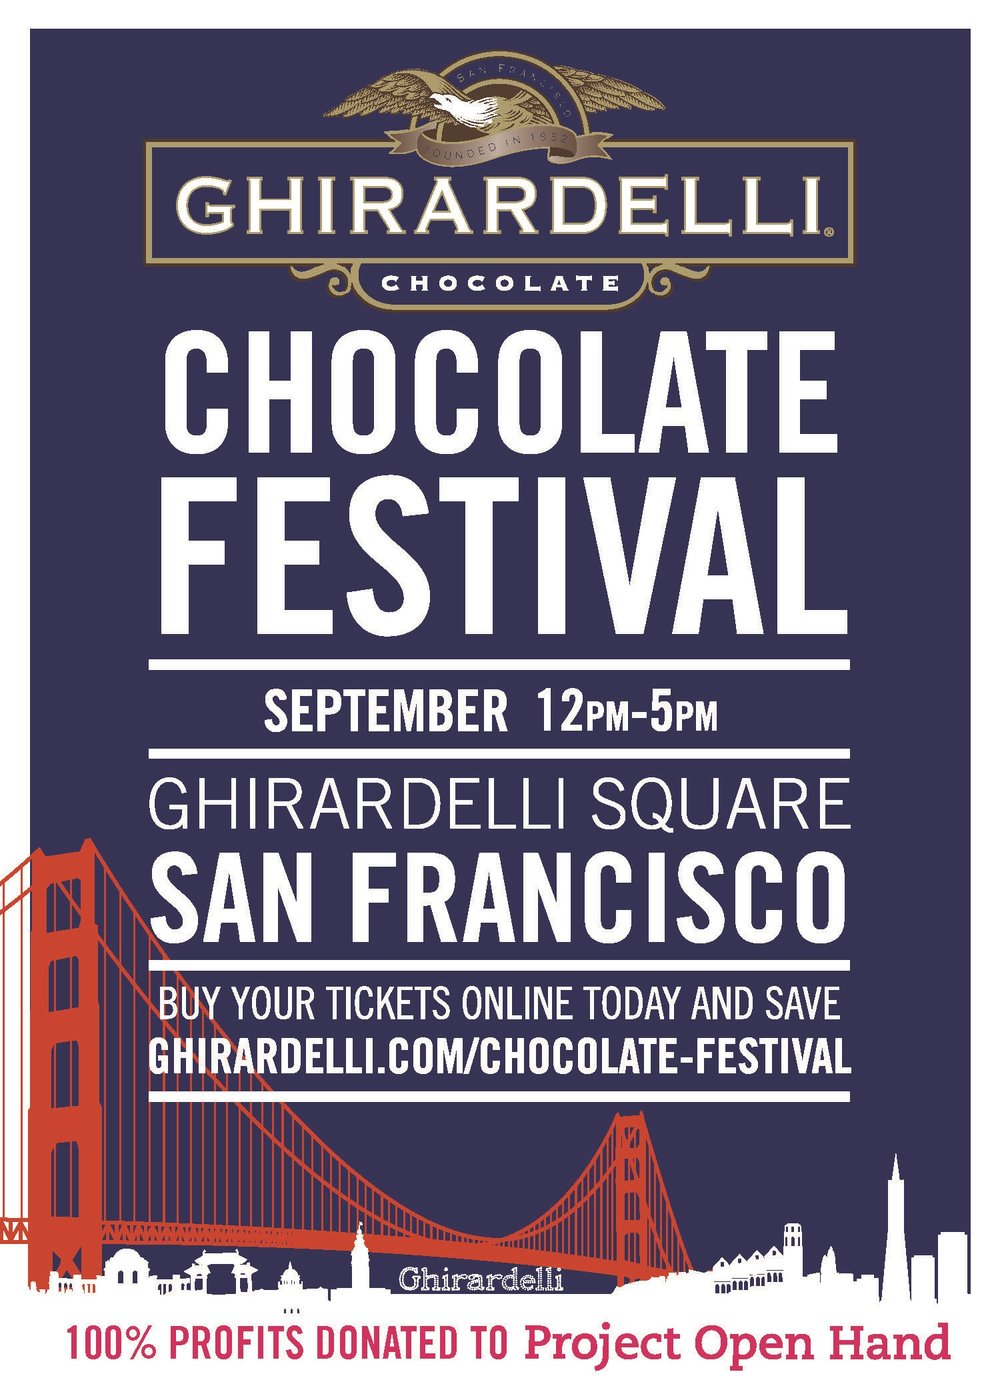 Chocolate-Festival-image-NO-DATE.jpg